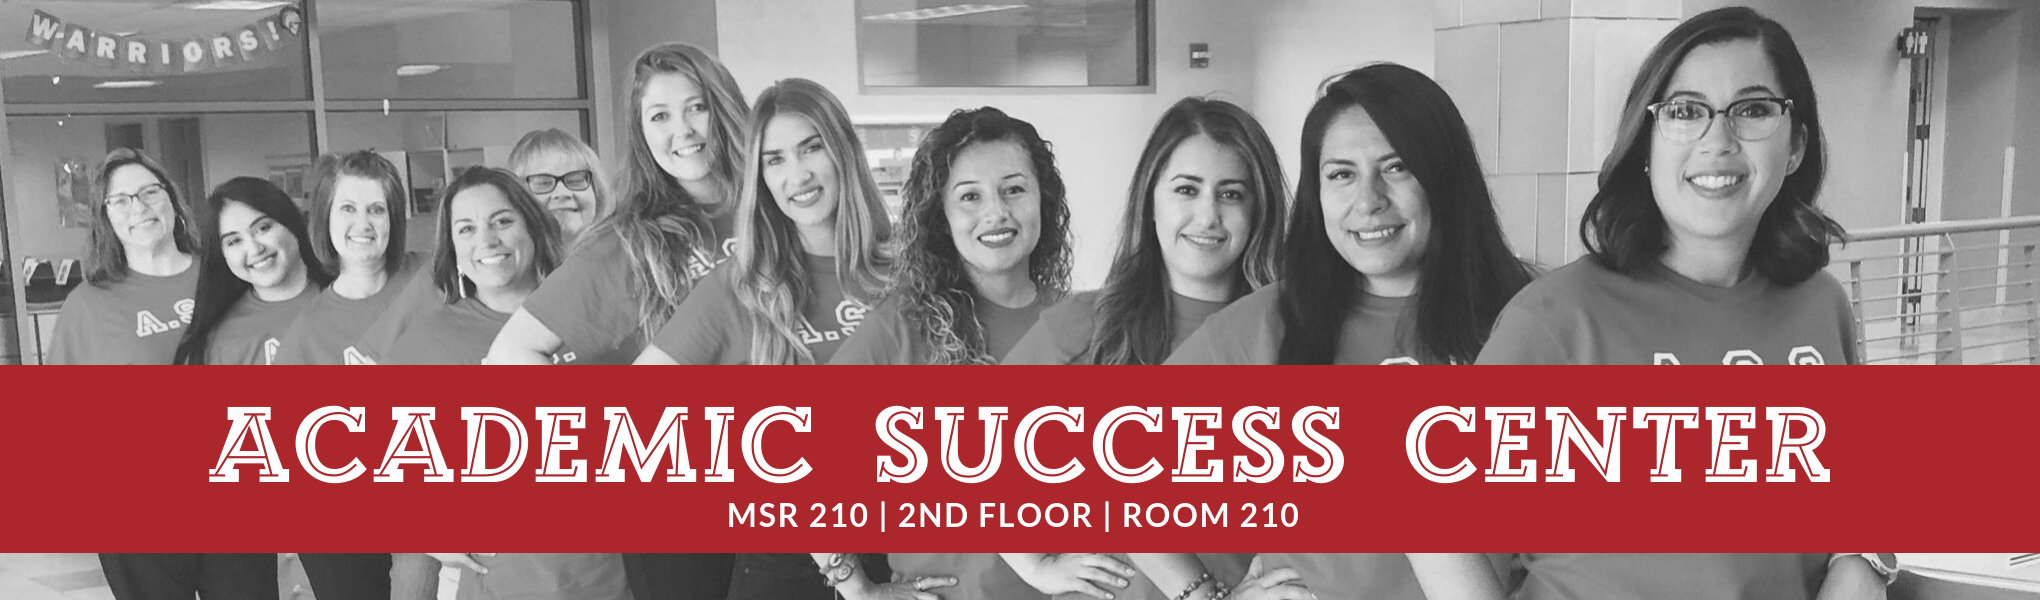 Academic Success Center, MSR210, 2nd floor, room 210